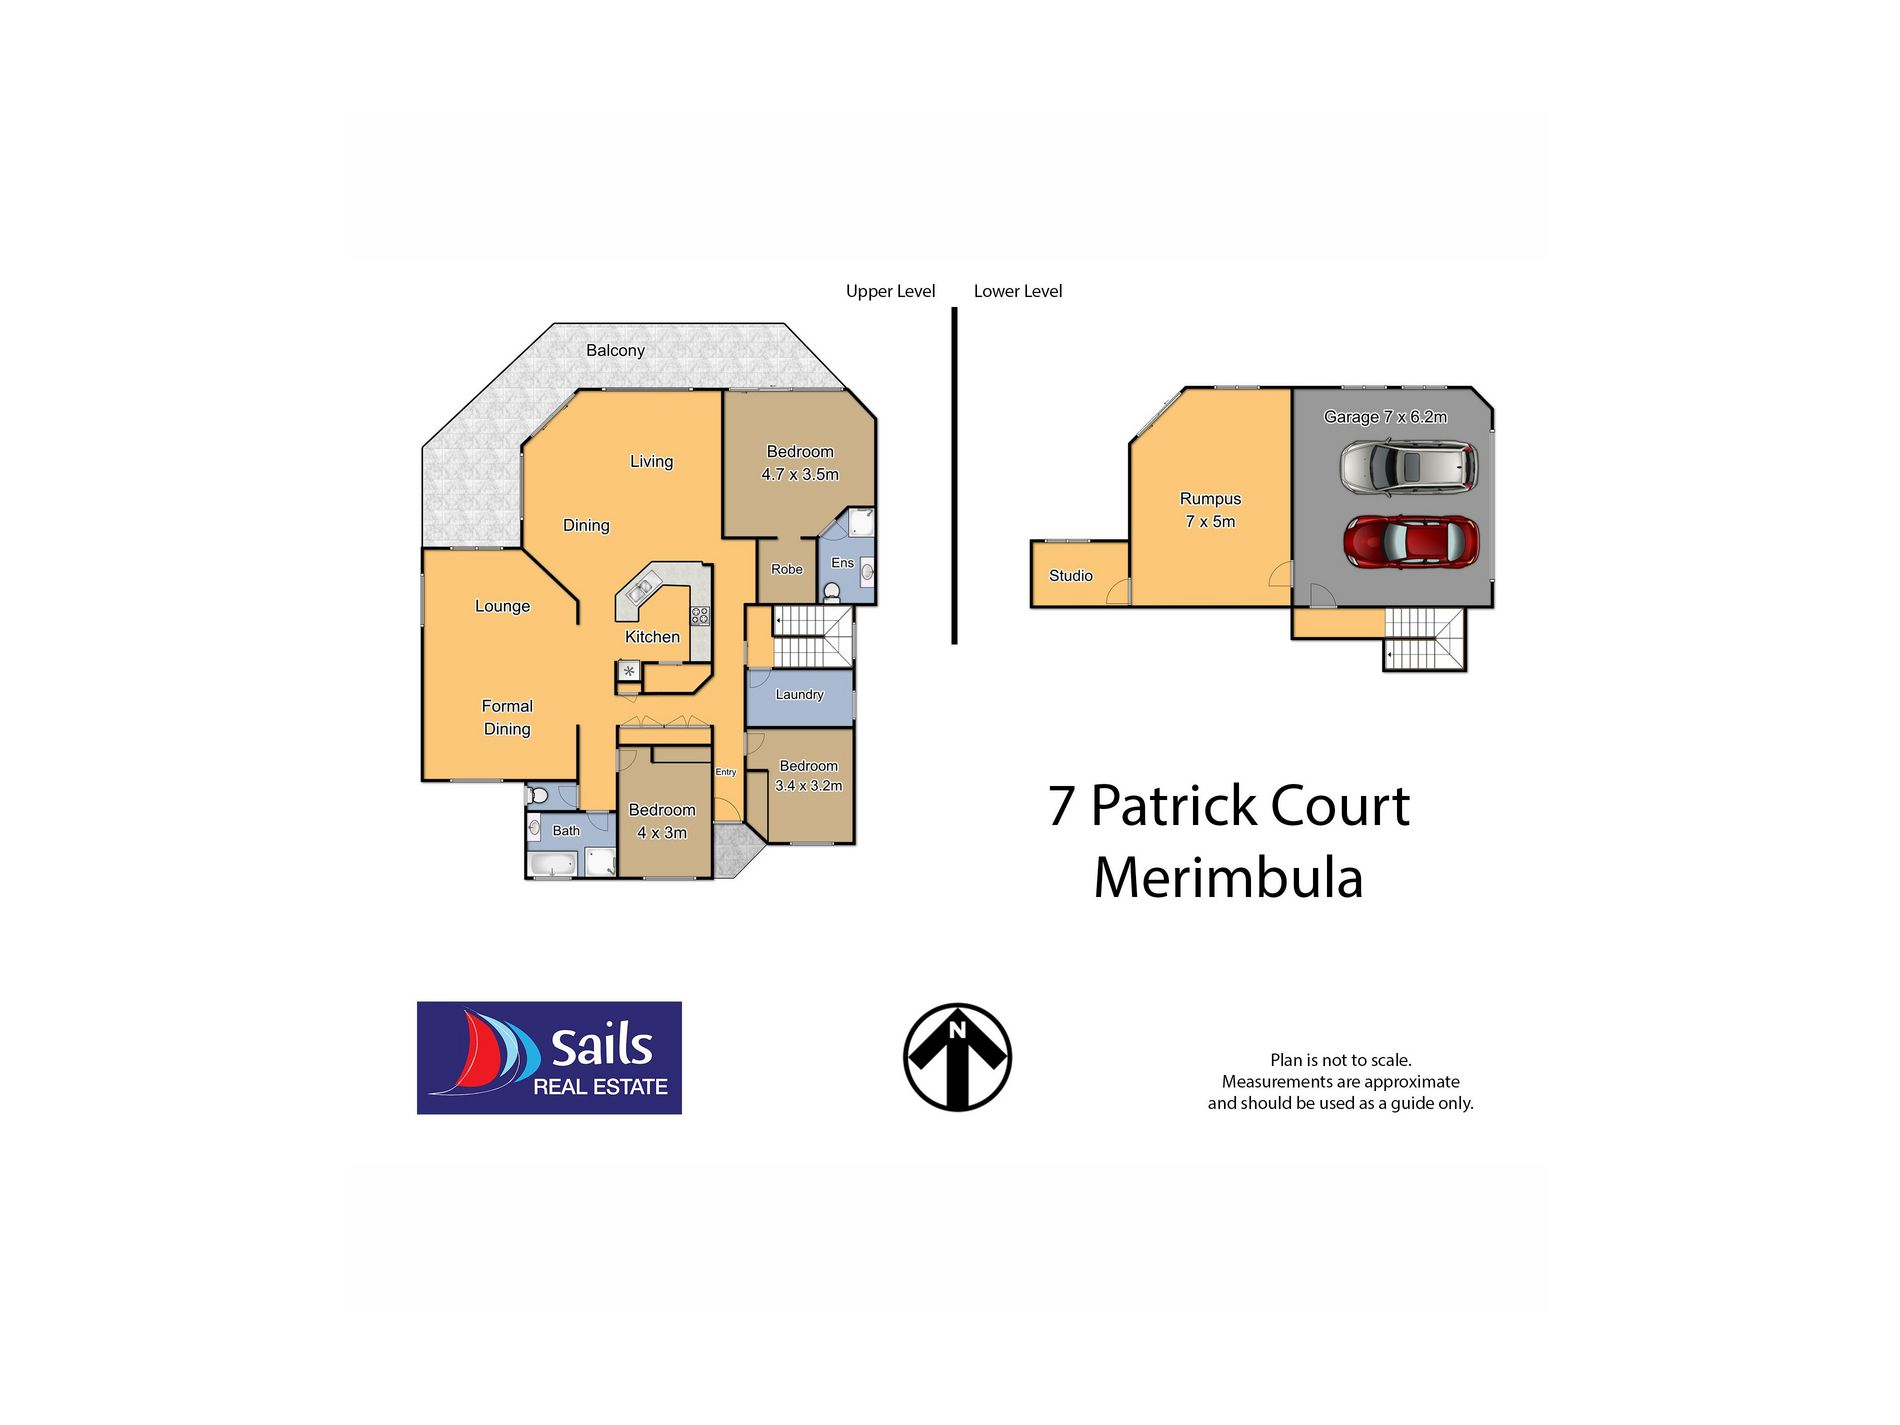 7 Patrick Court, Merimbula